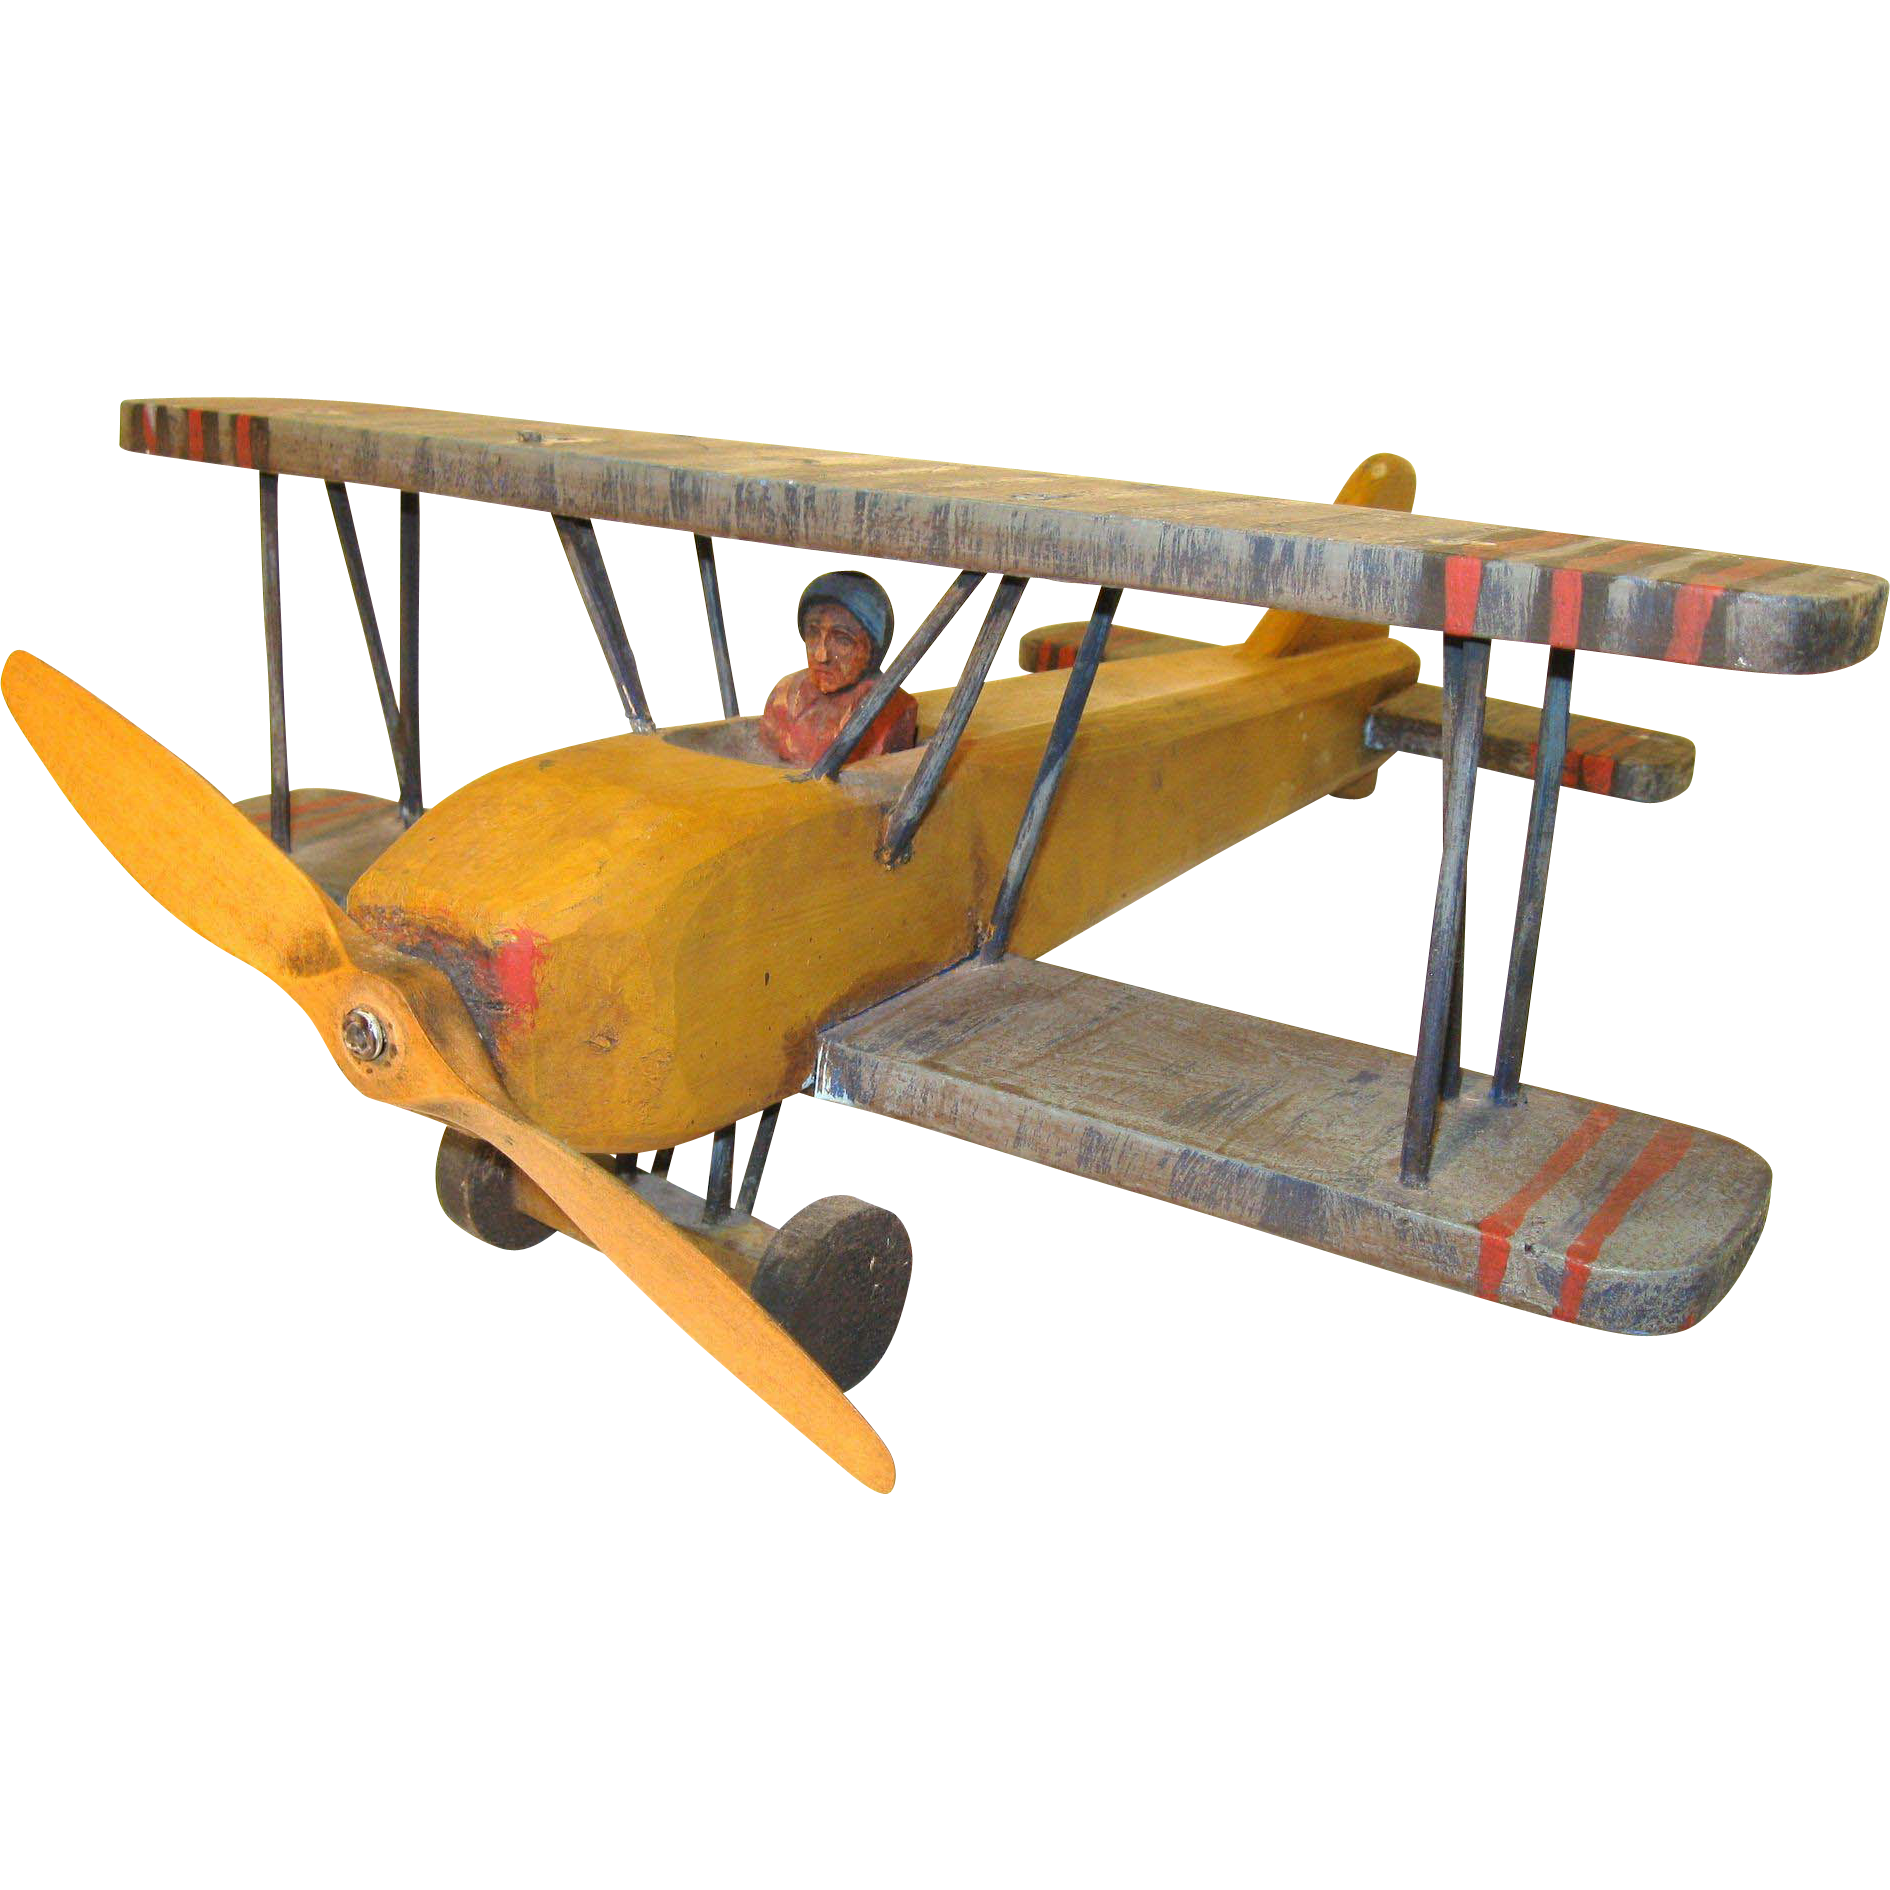 Vintage Folk Art Wood Air Plane